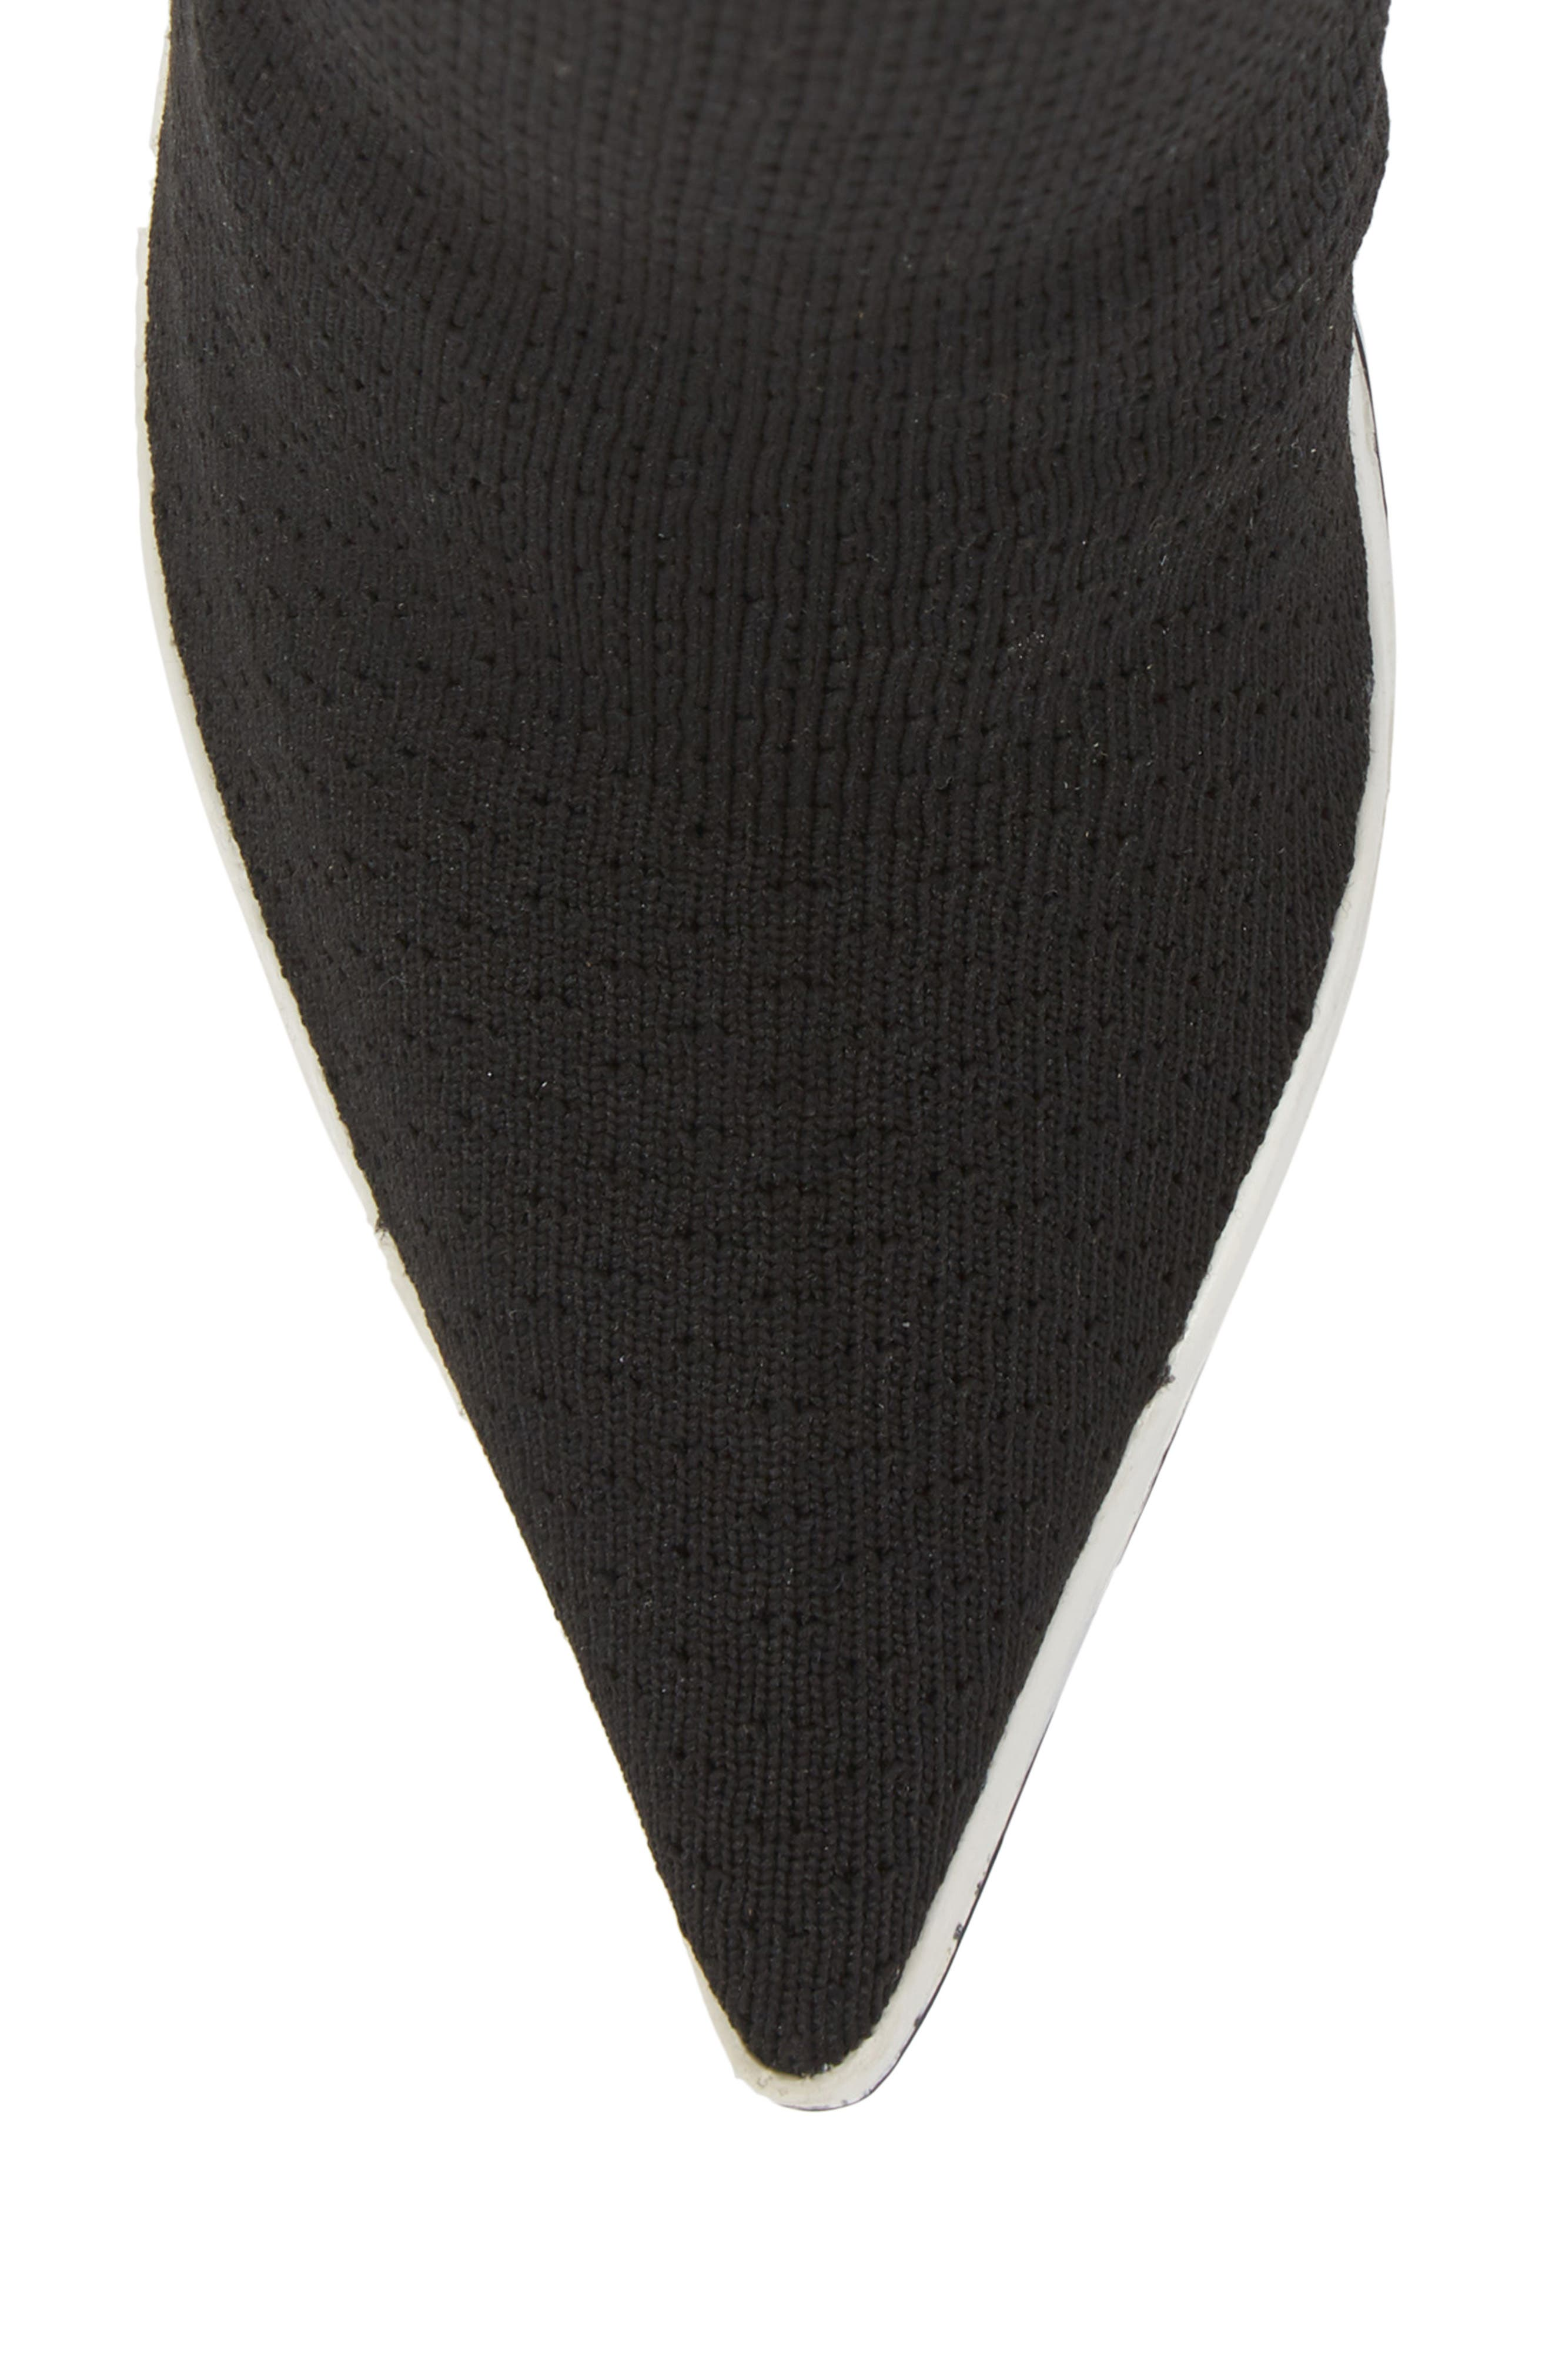 JEFFREY CAMPBELL, Goal Sock Sneaker Bootie, Alternate thumbnail 5, color, BLACK/ WHITE FABRIC